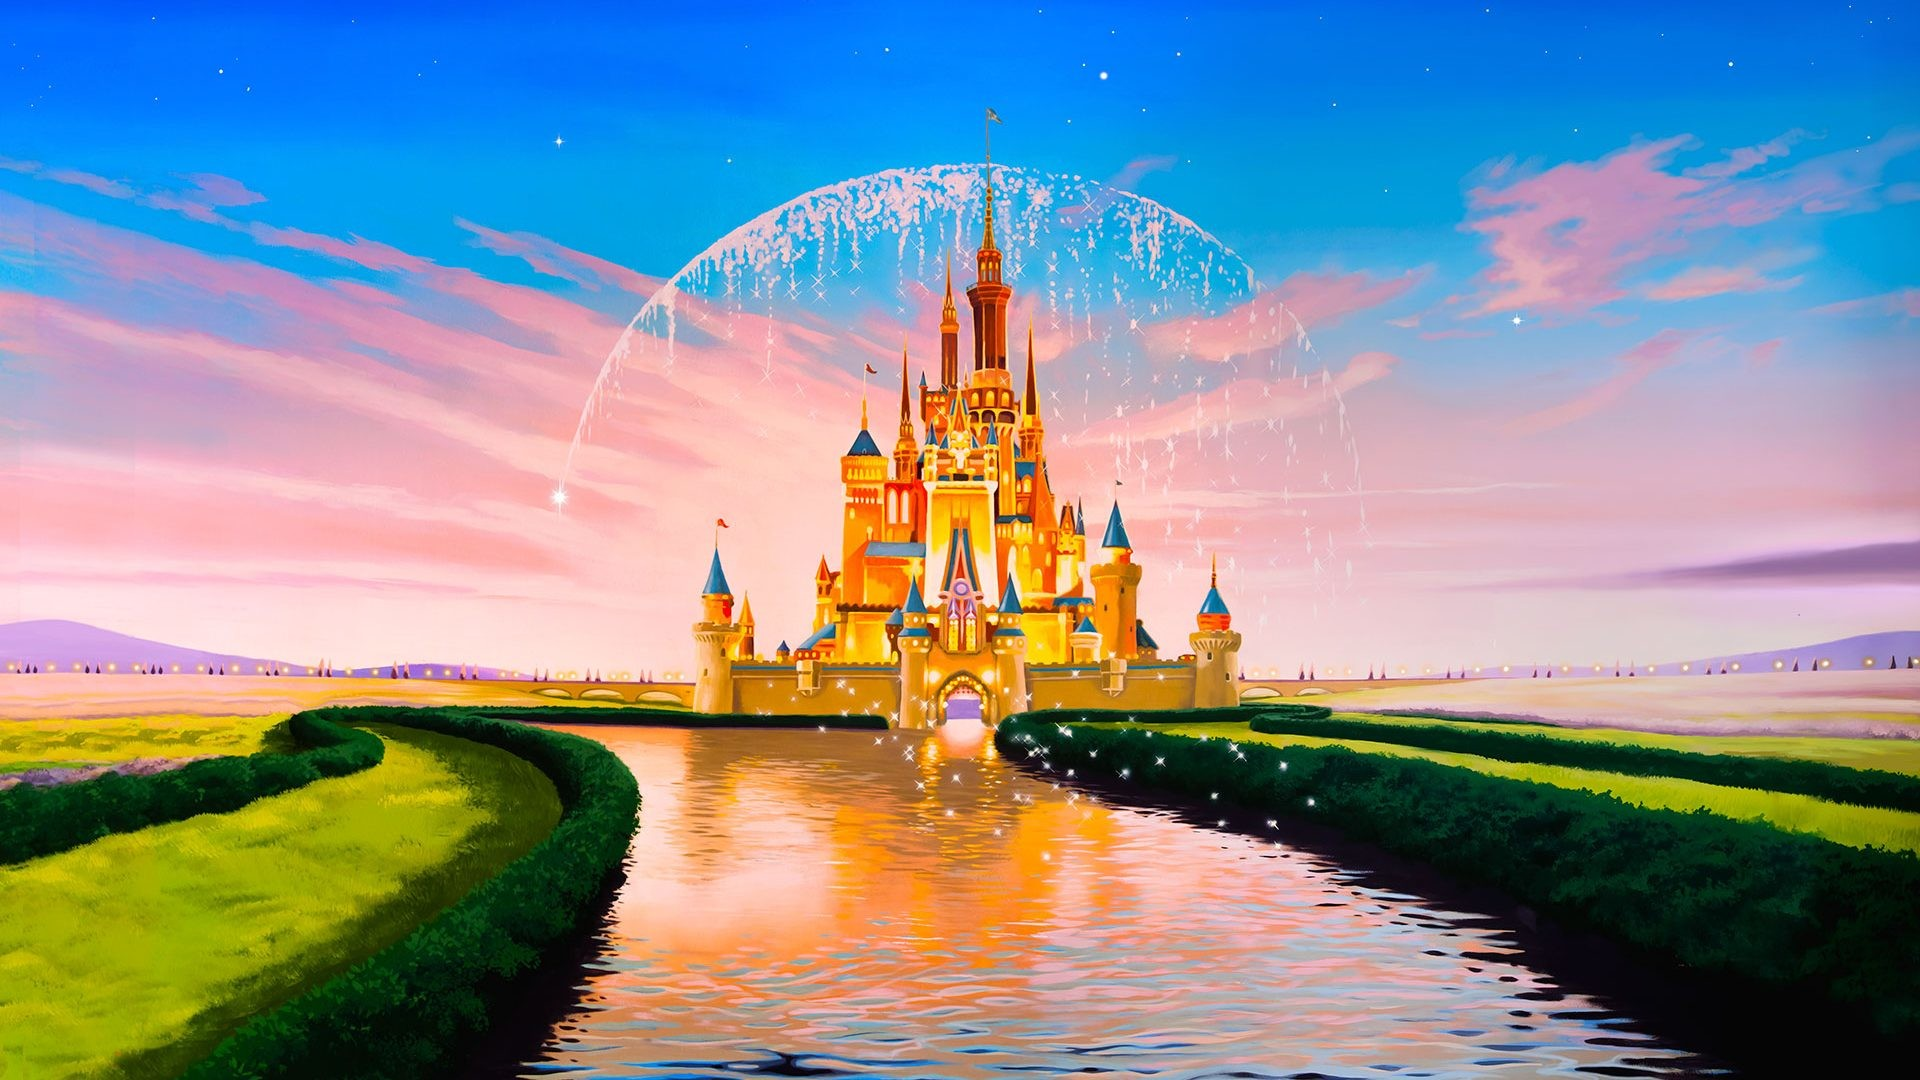 Disney castle wallpaper mobile 1920×1080.